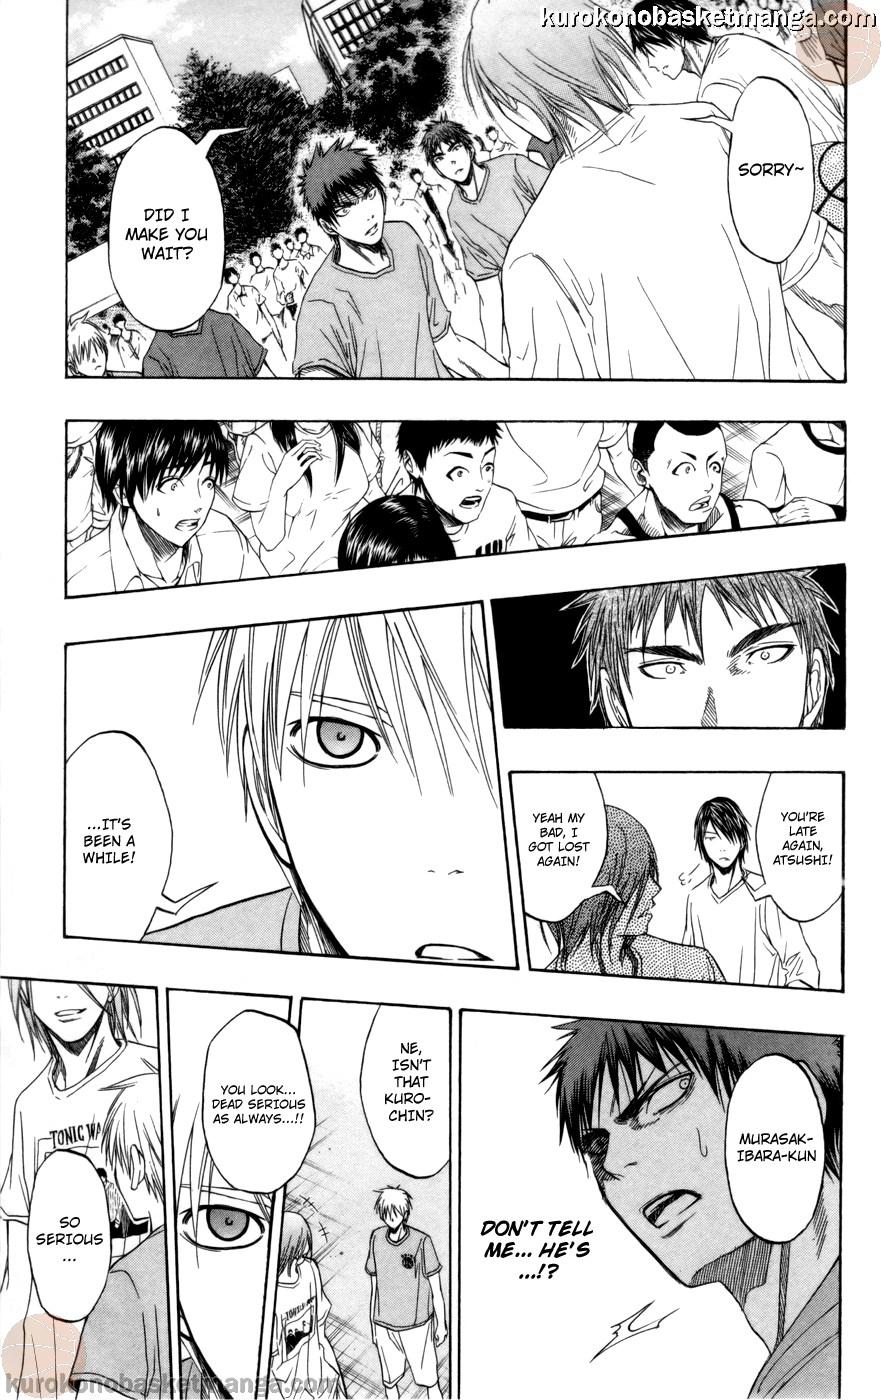 Kuroko no Basket Manga Chapter 77 - Image 17